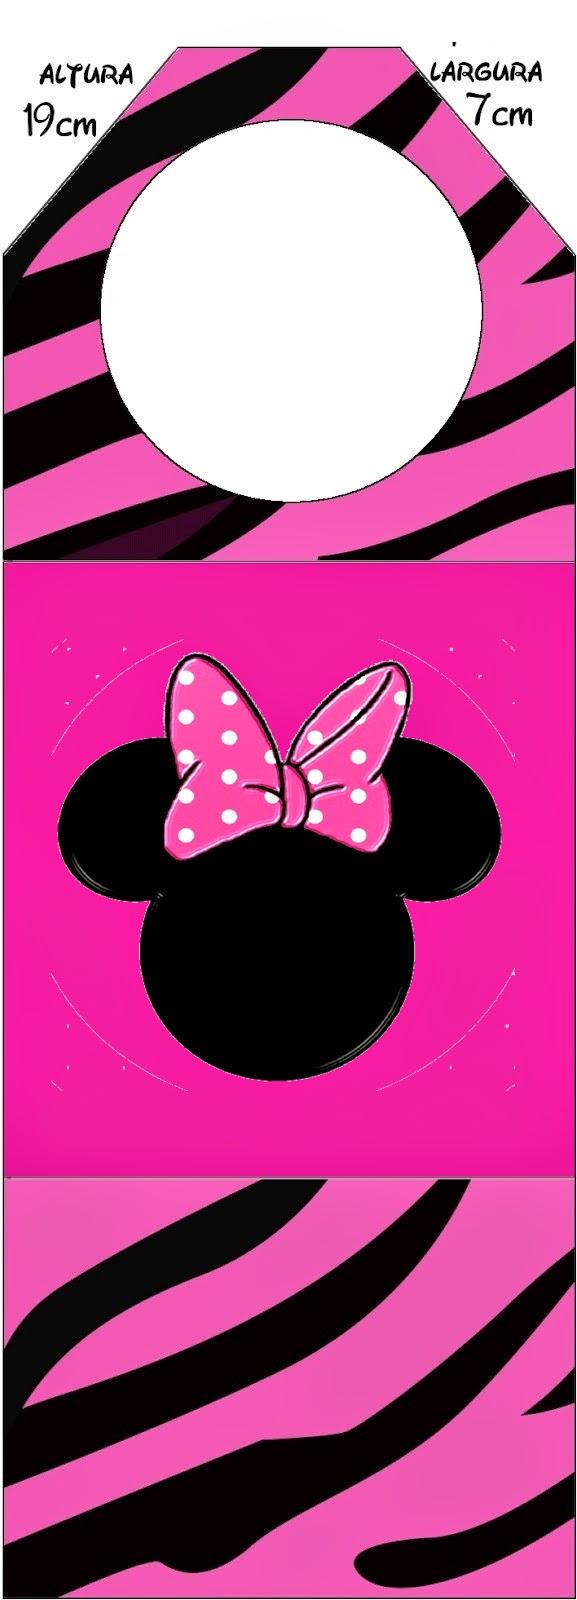 Marcapaginas para Imprimir Gratis de Minnie Cebra Rosa.